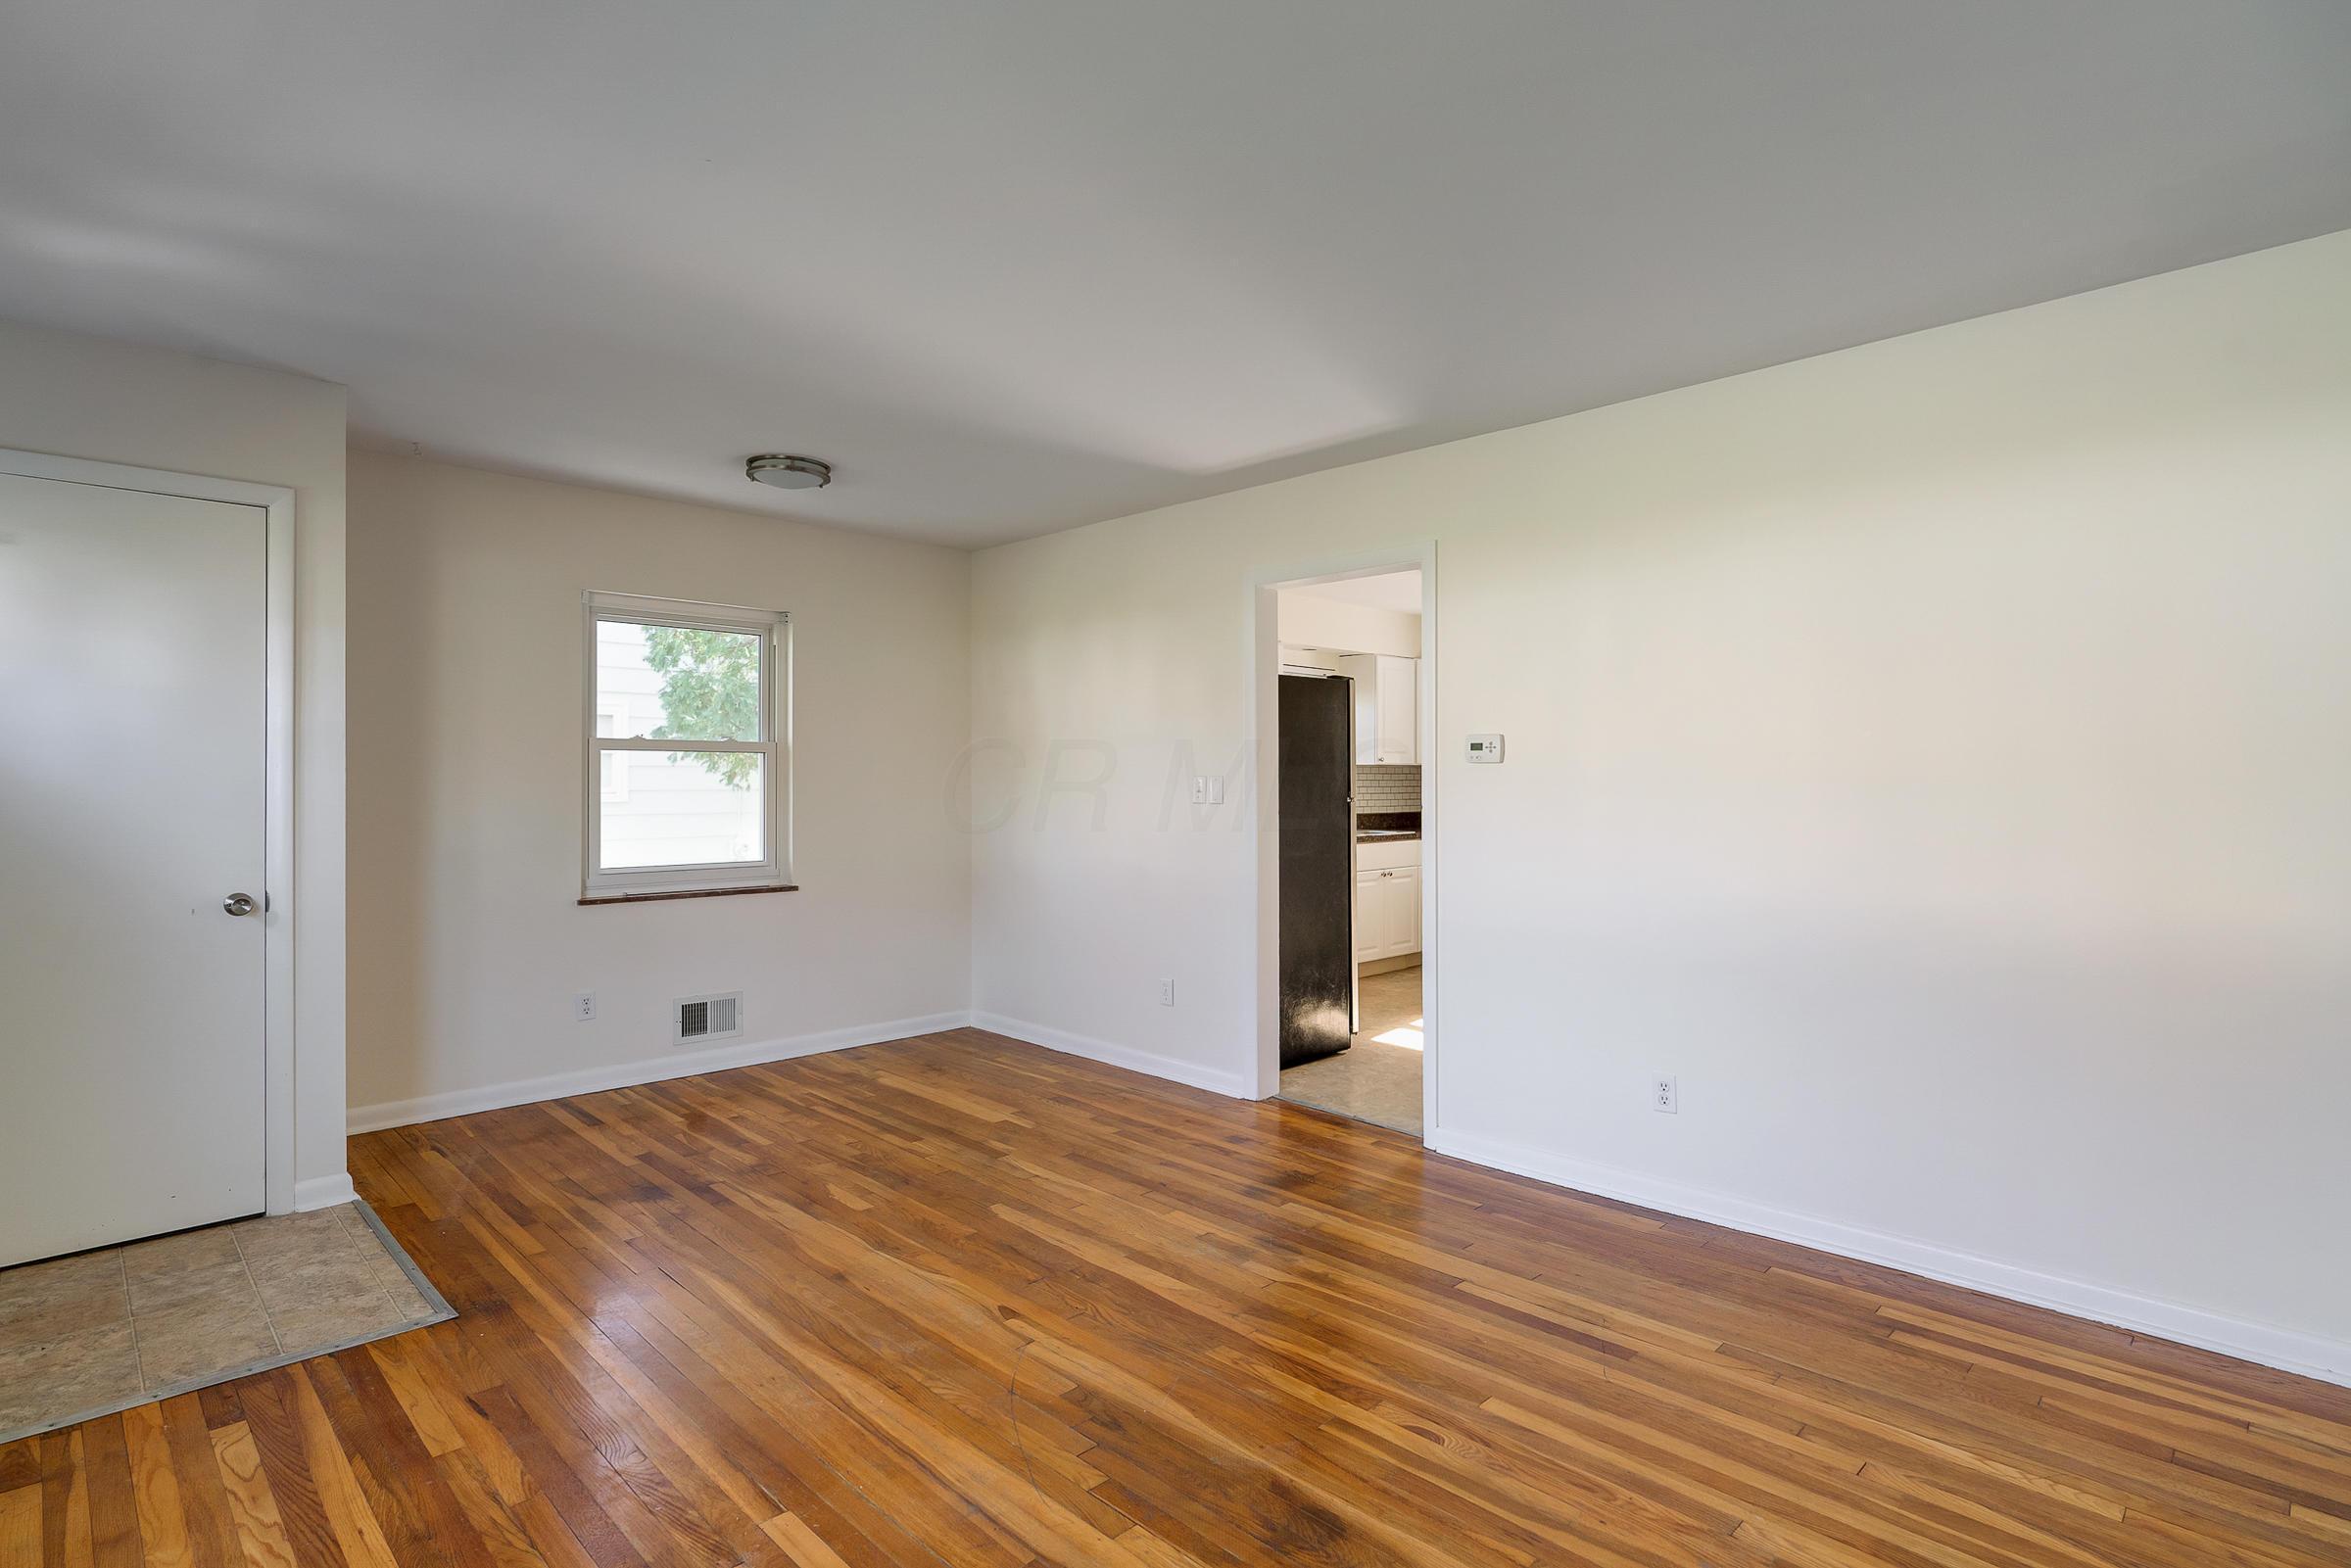 2553 Woodstock Road, Upper Arlington, Ohio 43221, 3 Bedrooms Bedrooms, ,1 BathroomBathrooms,Residential,For Sale,Woodstock,220040903